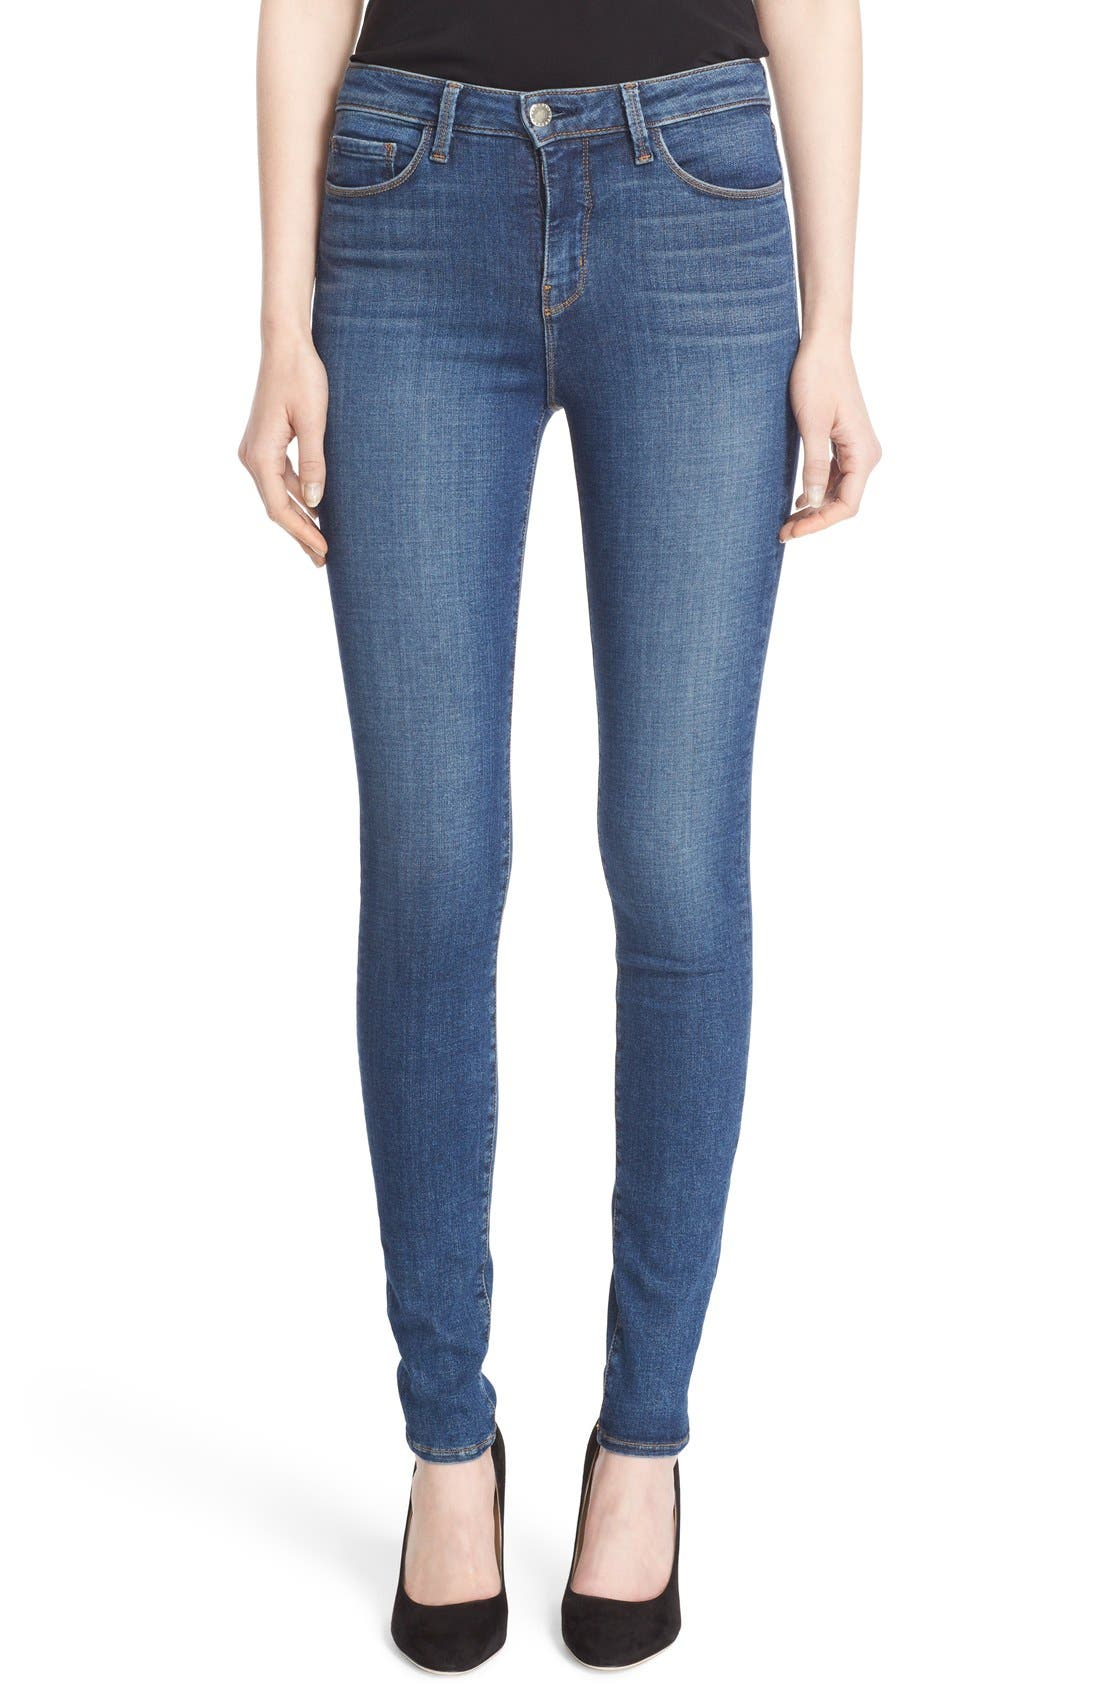 '30' High Rise Skinny Jeans,                         Main,                         color, Dark Vintage